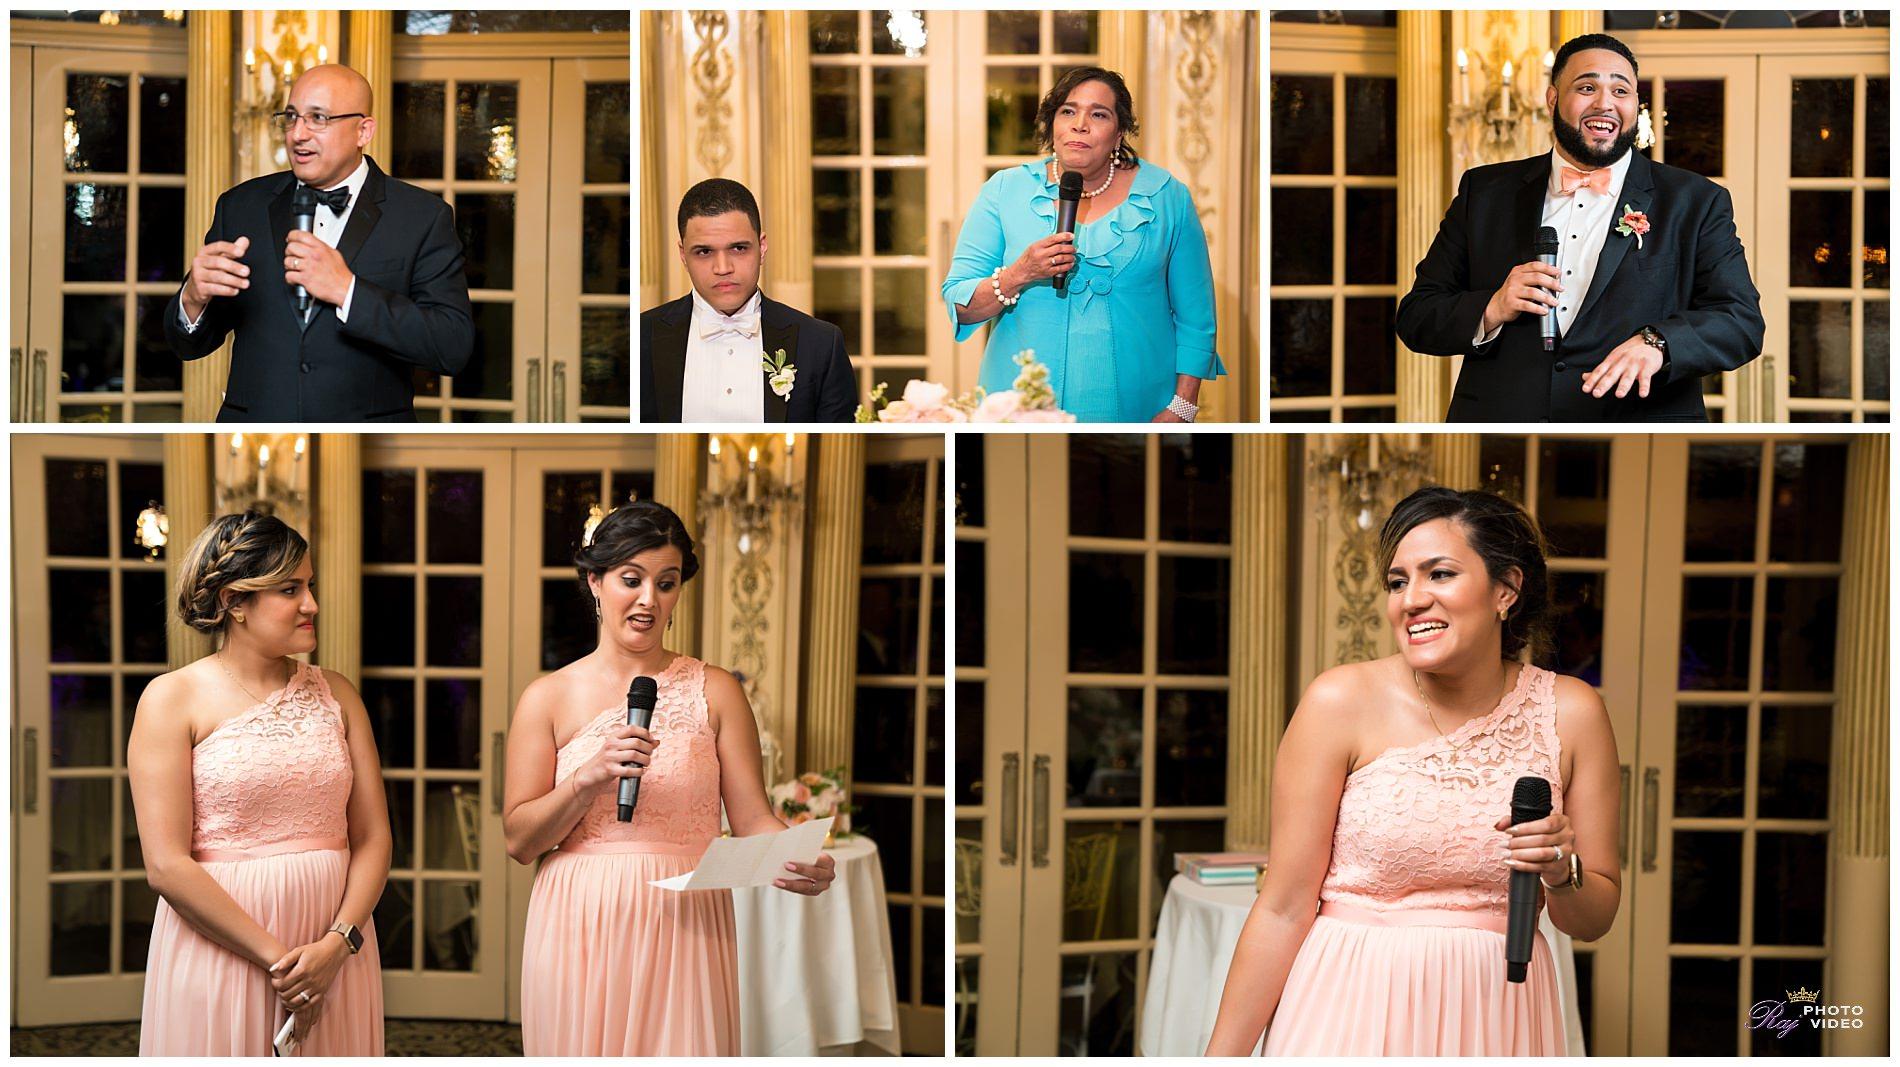 The-Manor-West-Orange-NJ-Wedding-Reception-Yanet-Jose-18.jpg